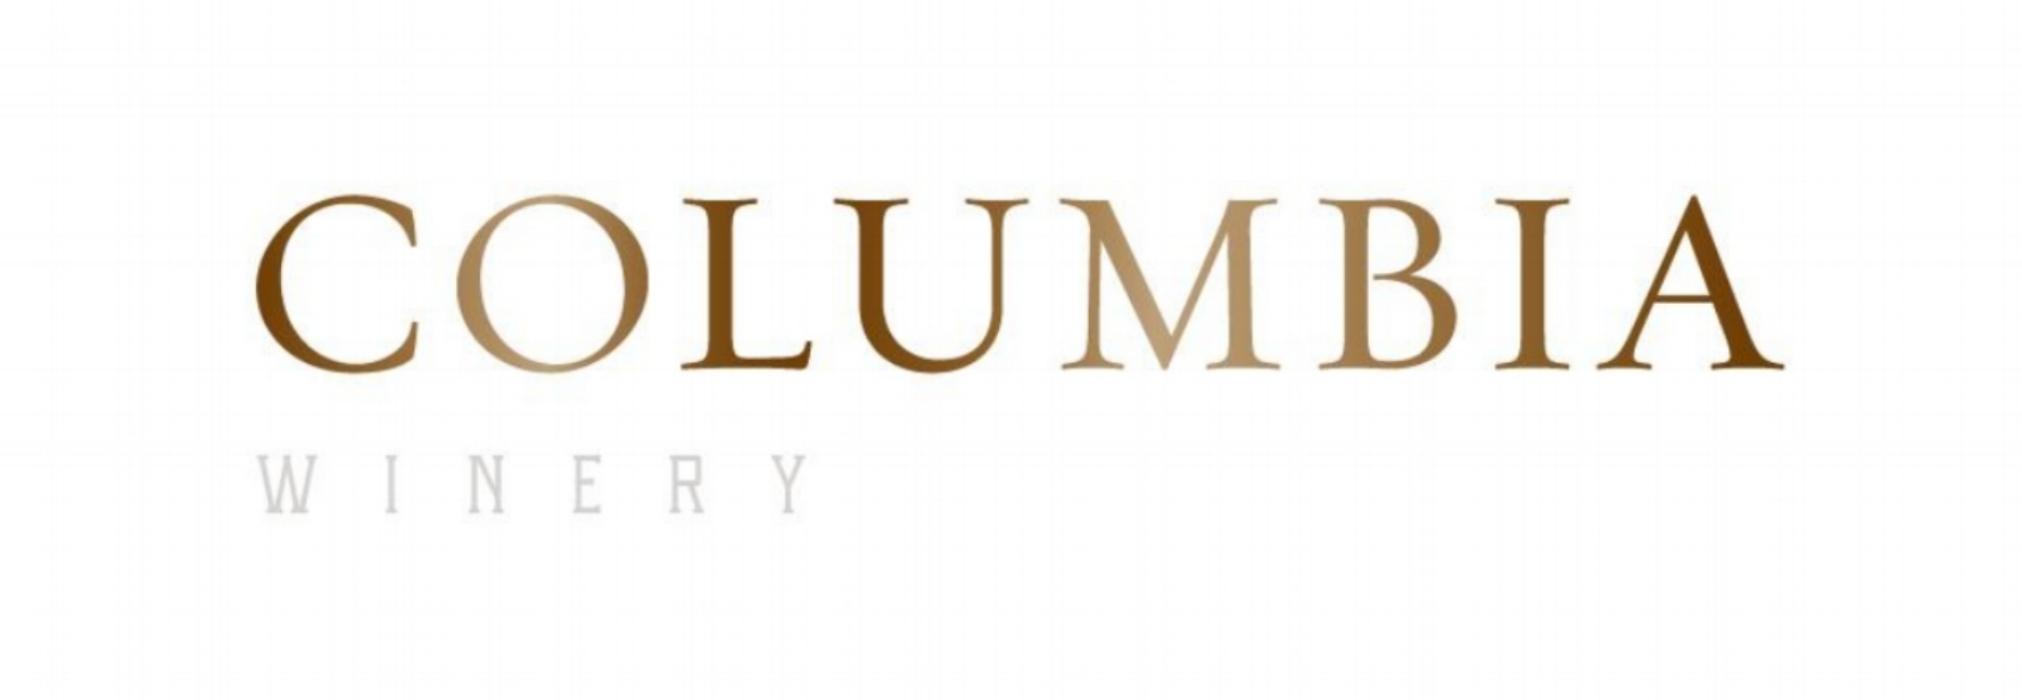 Columbia Logo 2014.jpg